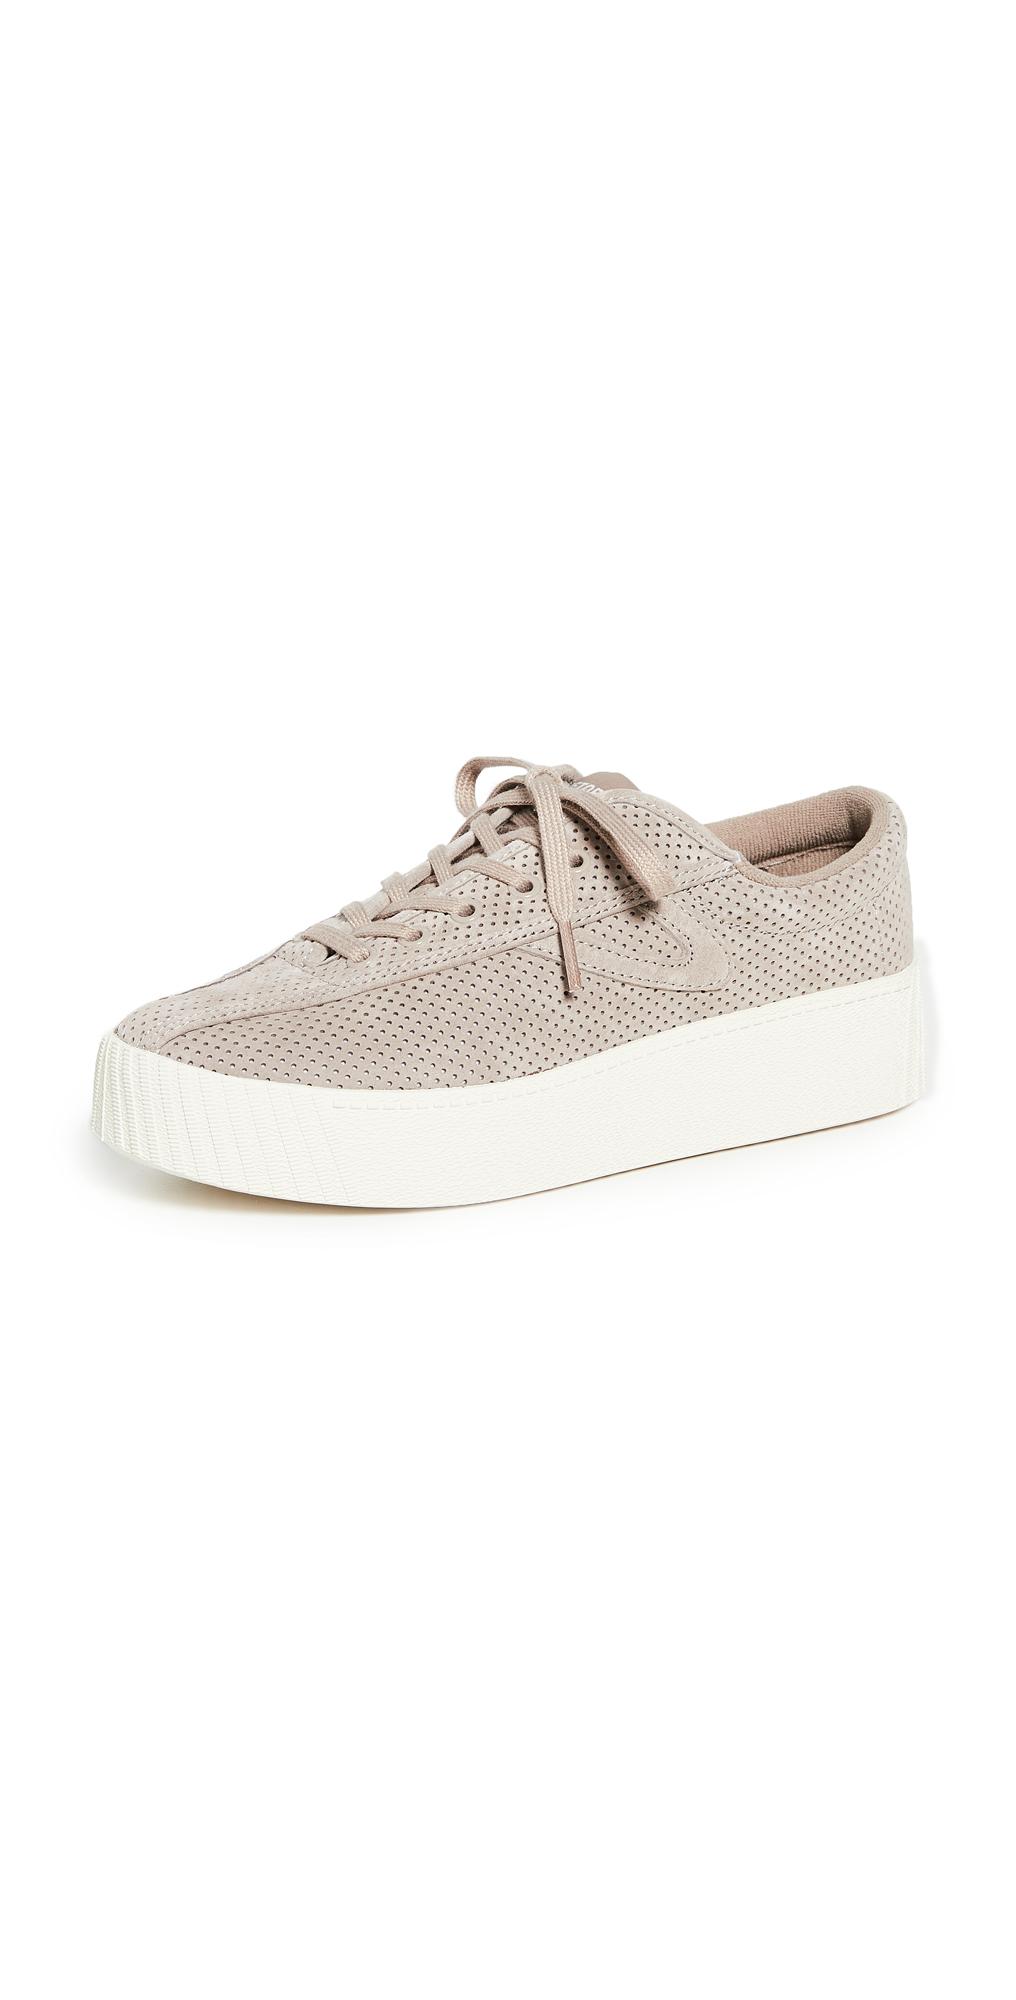 Tretorn Nylite Bold Platform Nubuck Sneakers